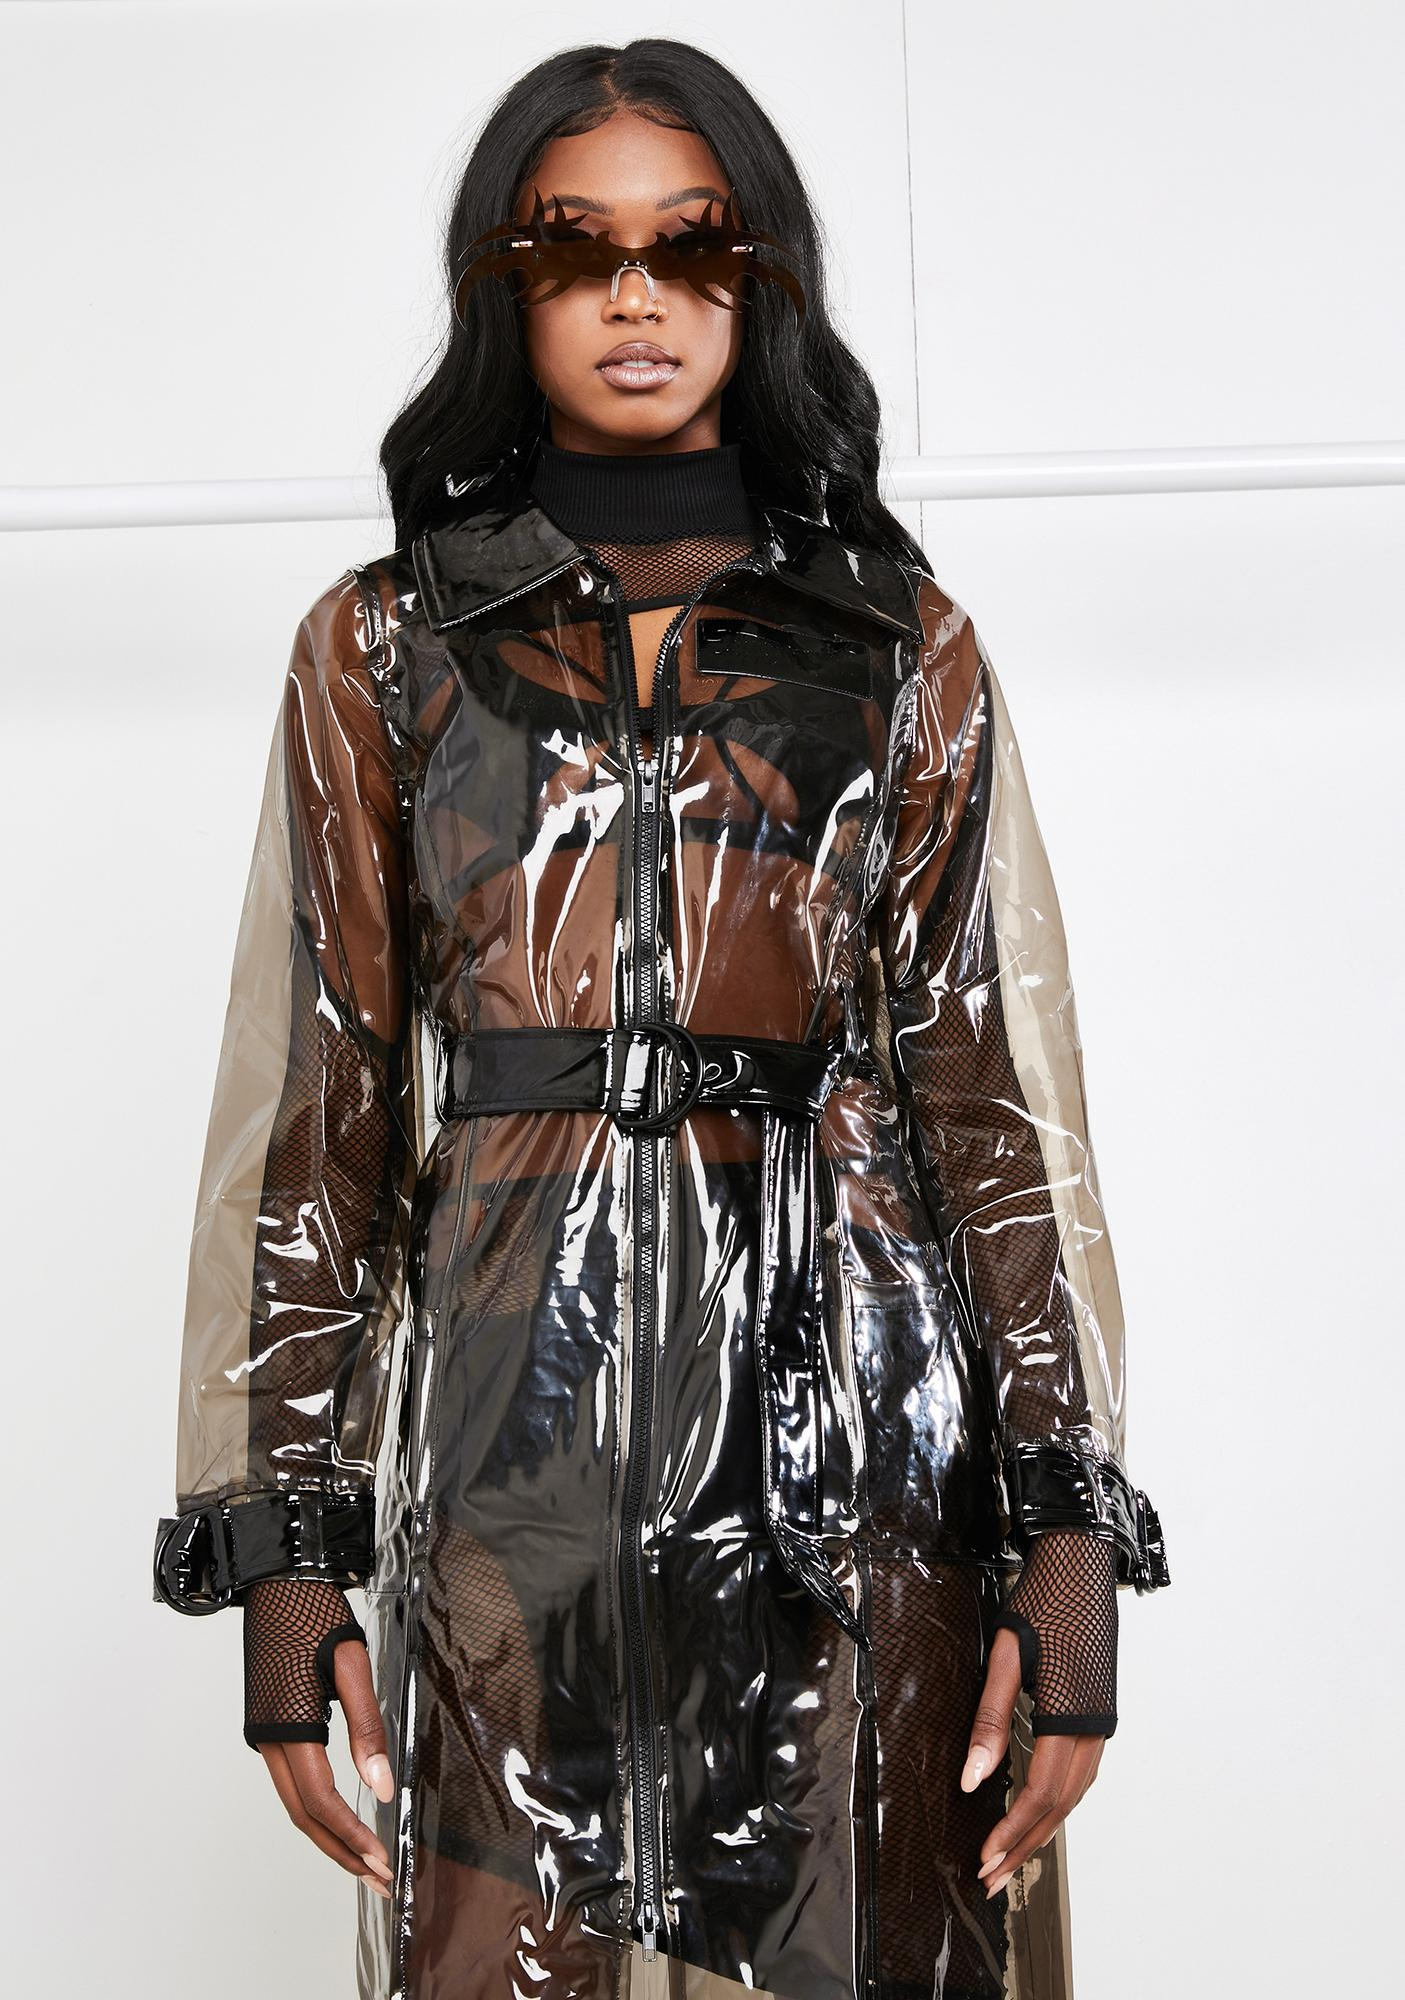 DARKER WAVS Clear PVC Trench Coat With Glitch Print